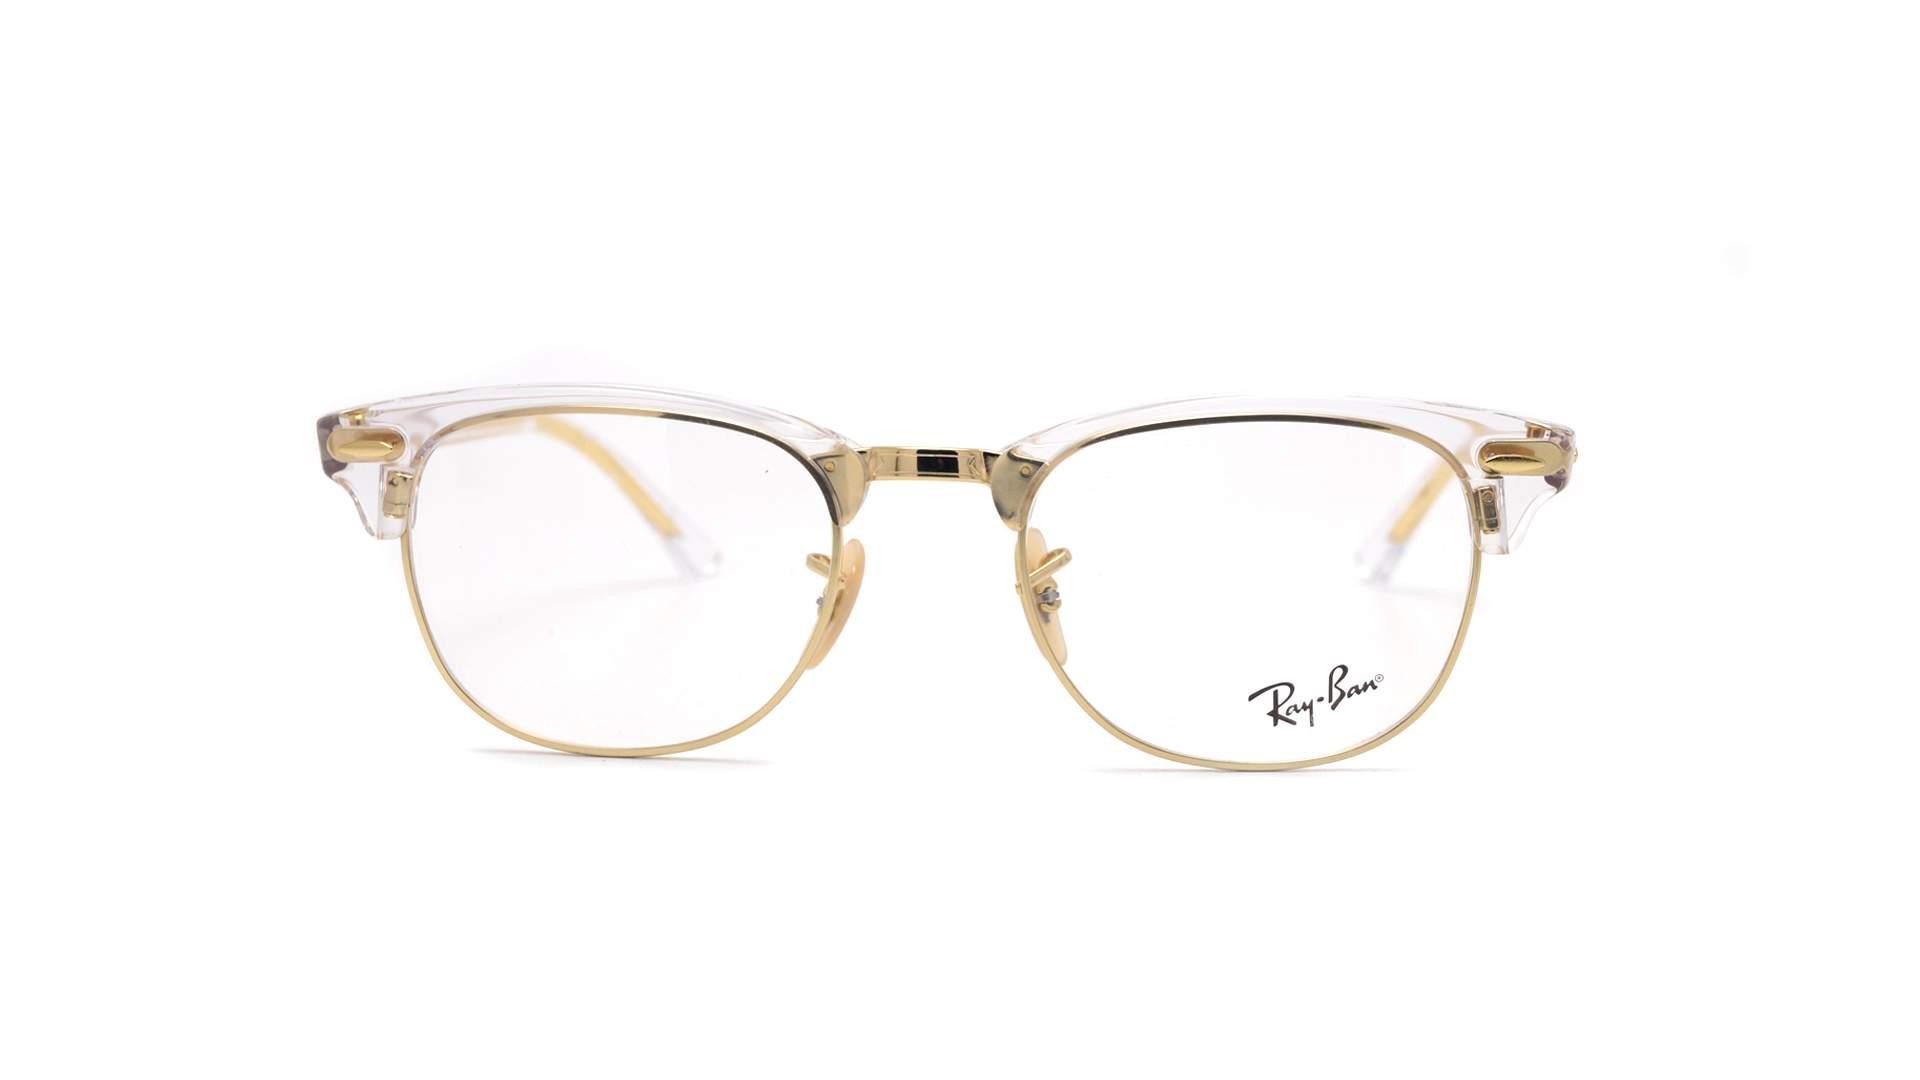 34f178c3562e4 Eyeglasses Ray-Ban Clubmaster Optics Gold RX5154 5762 51-21 Large